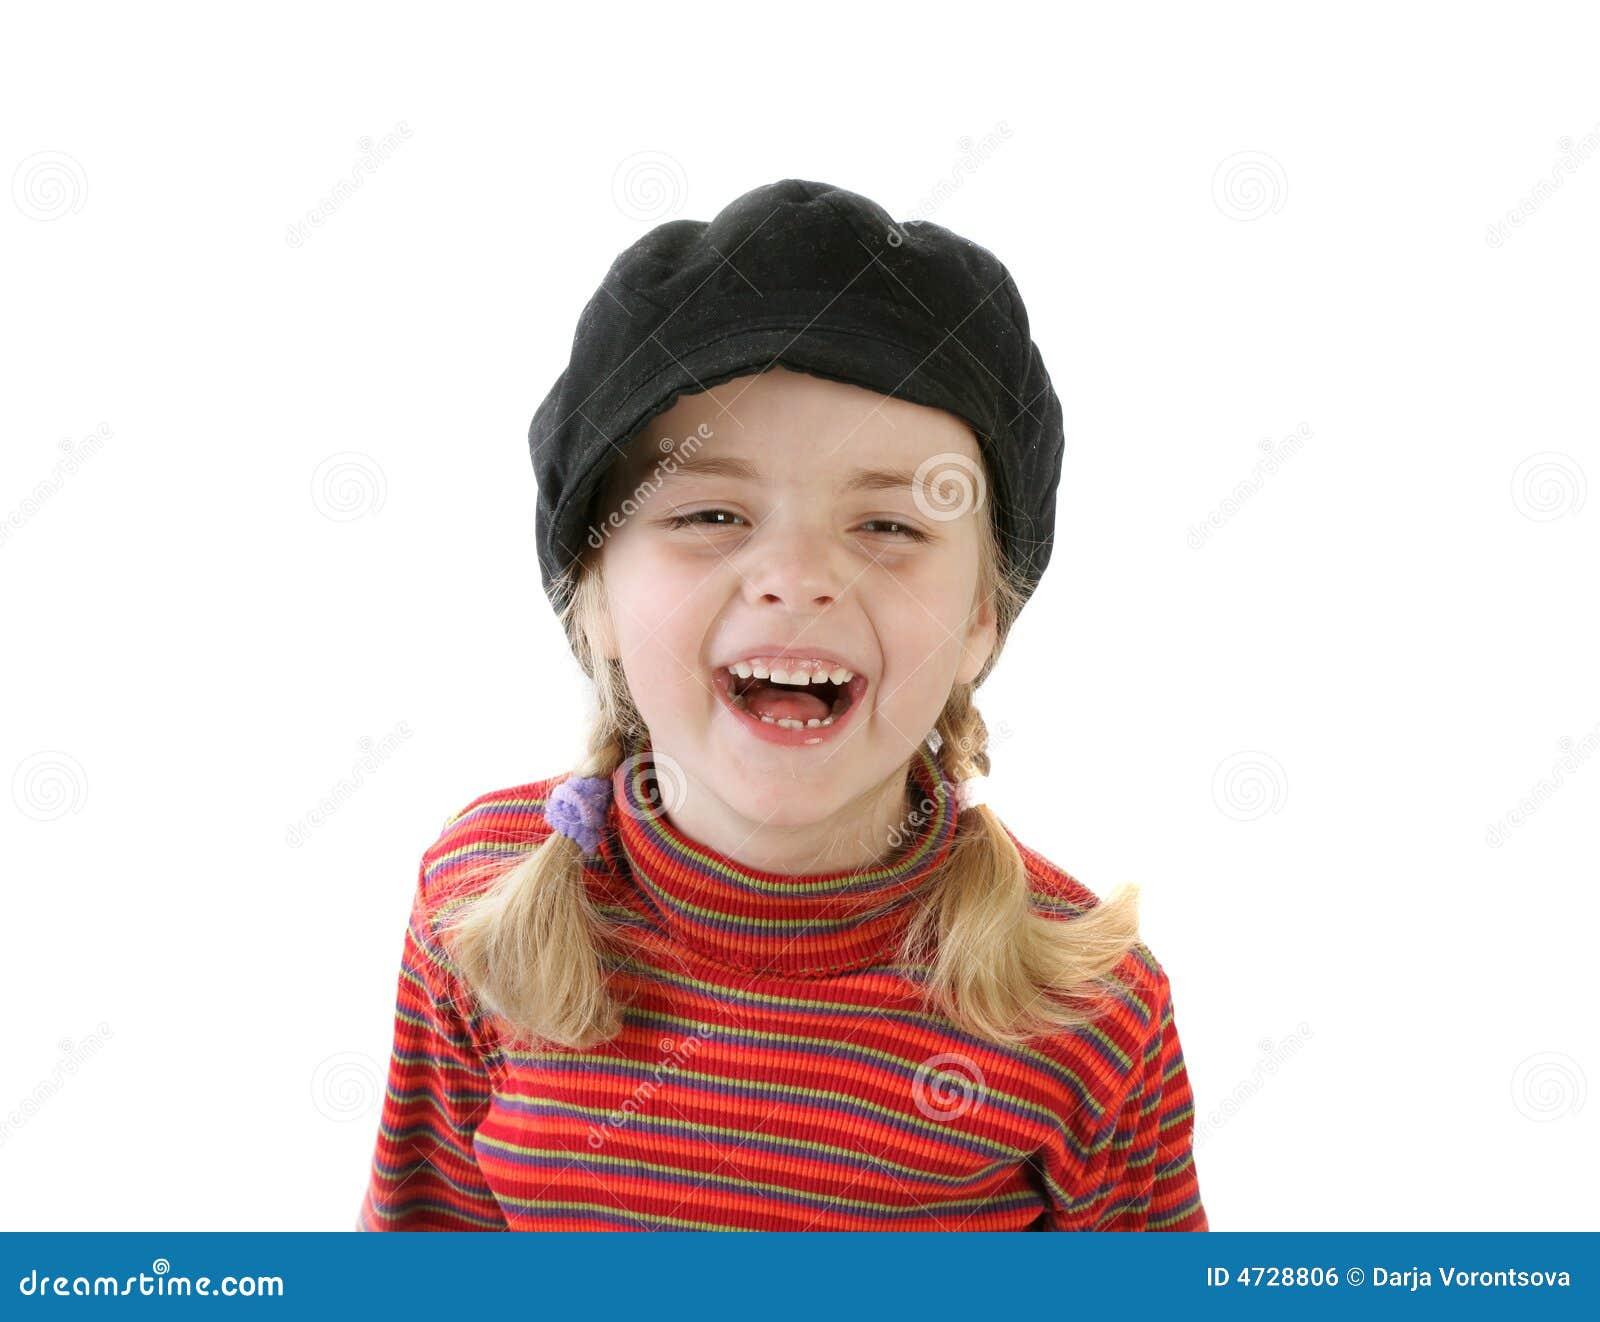 Hair Hatted Hooligans: Little Hooligan Royalty Free Stock Image